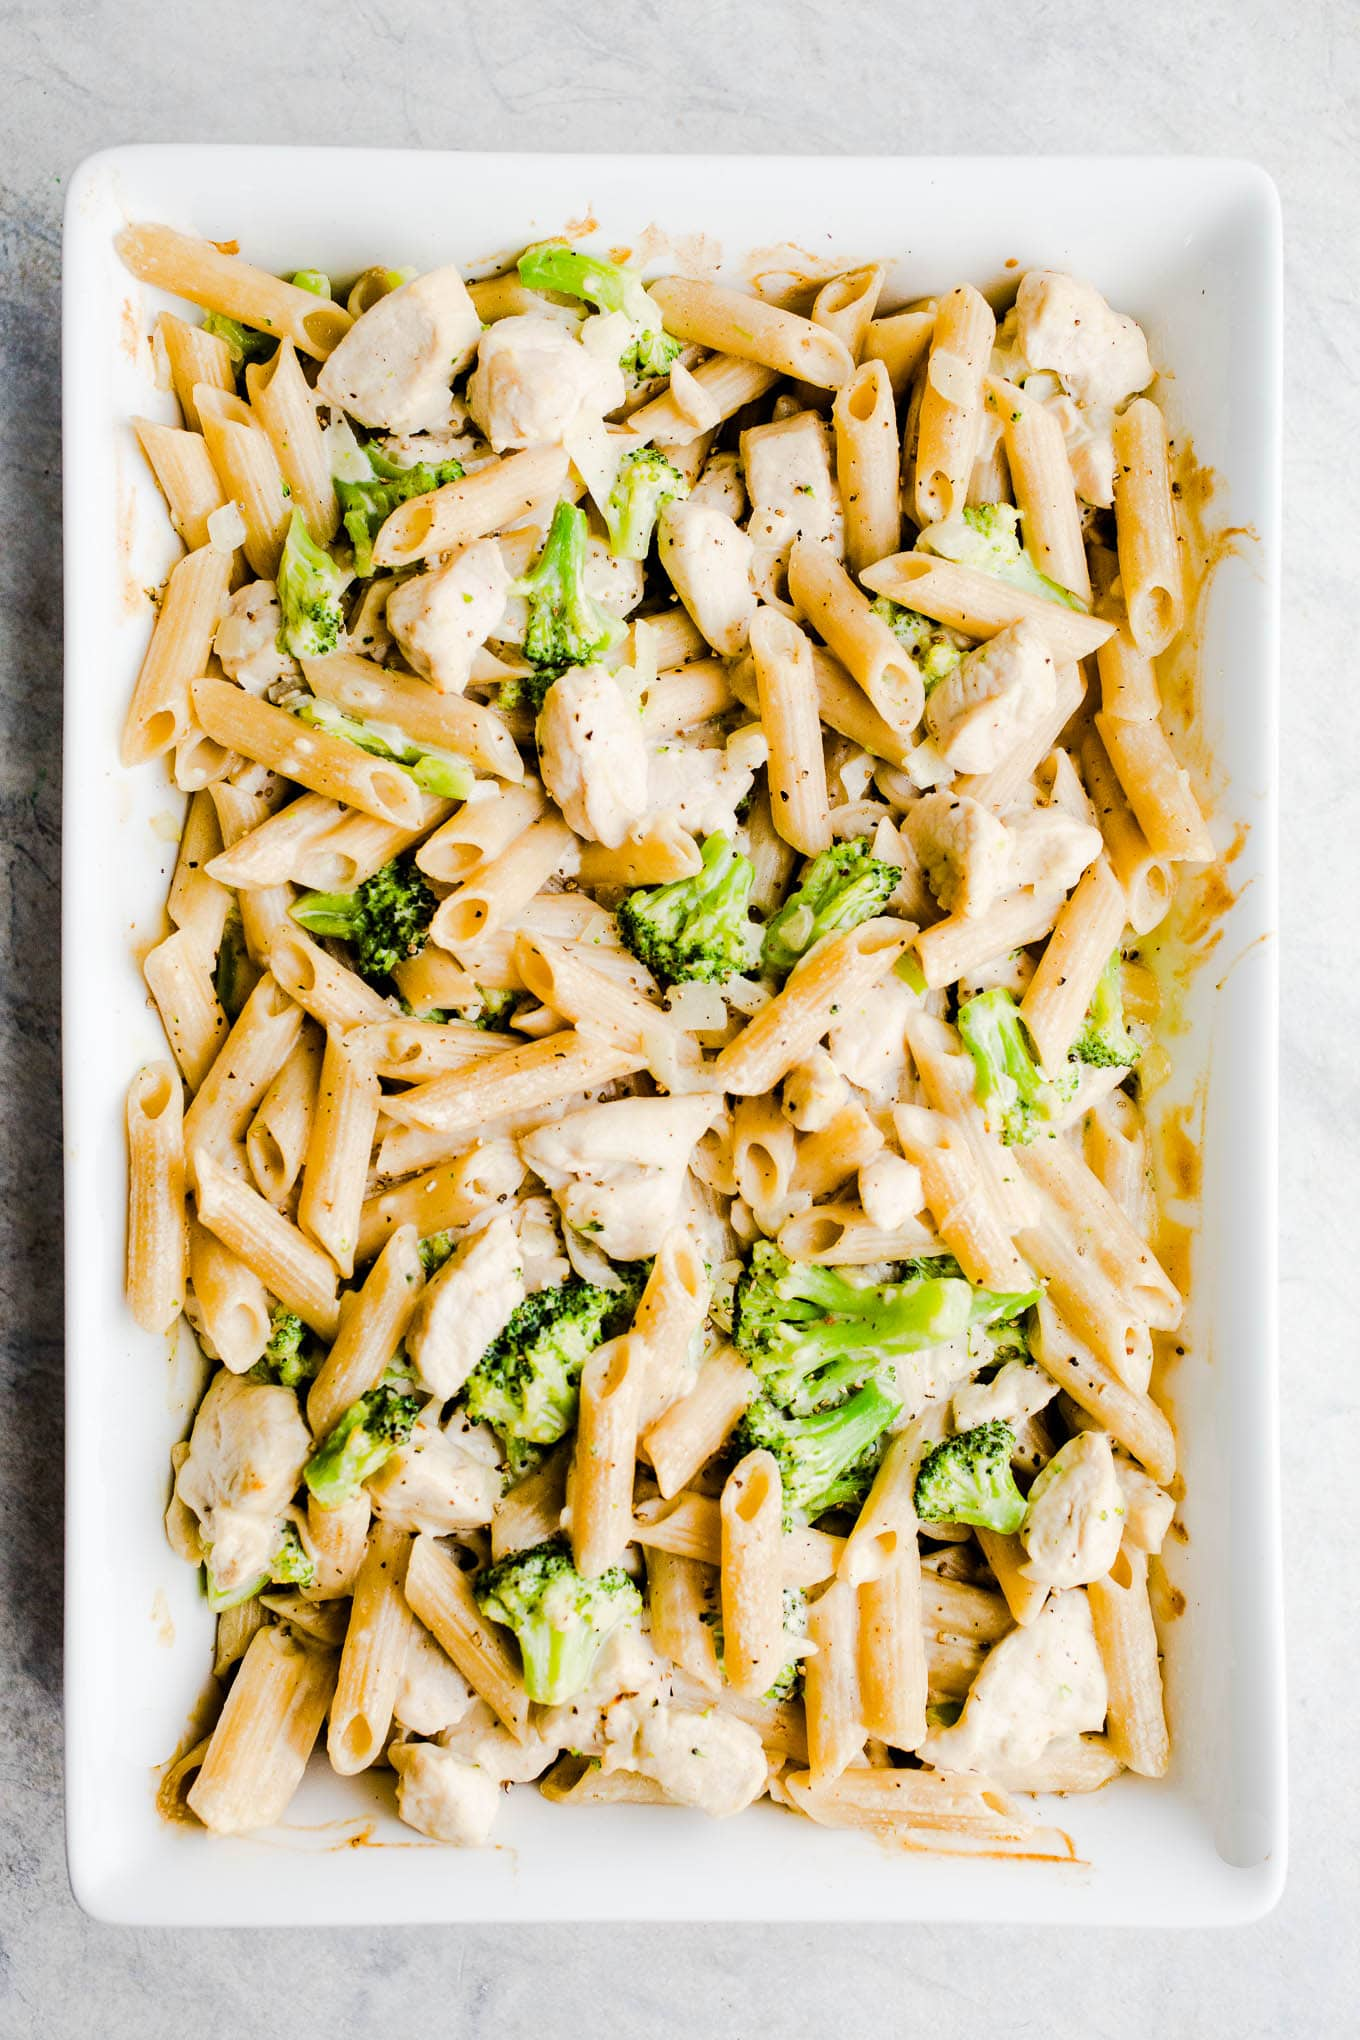 dairy-free chicken broccoli Alfredo bake